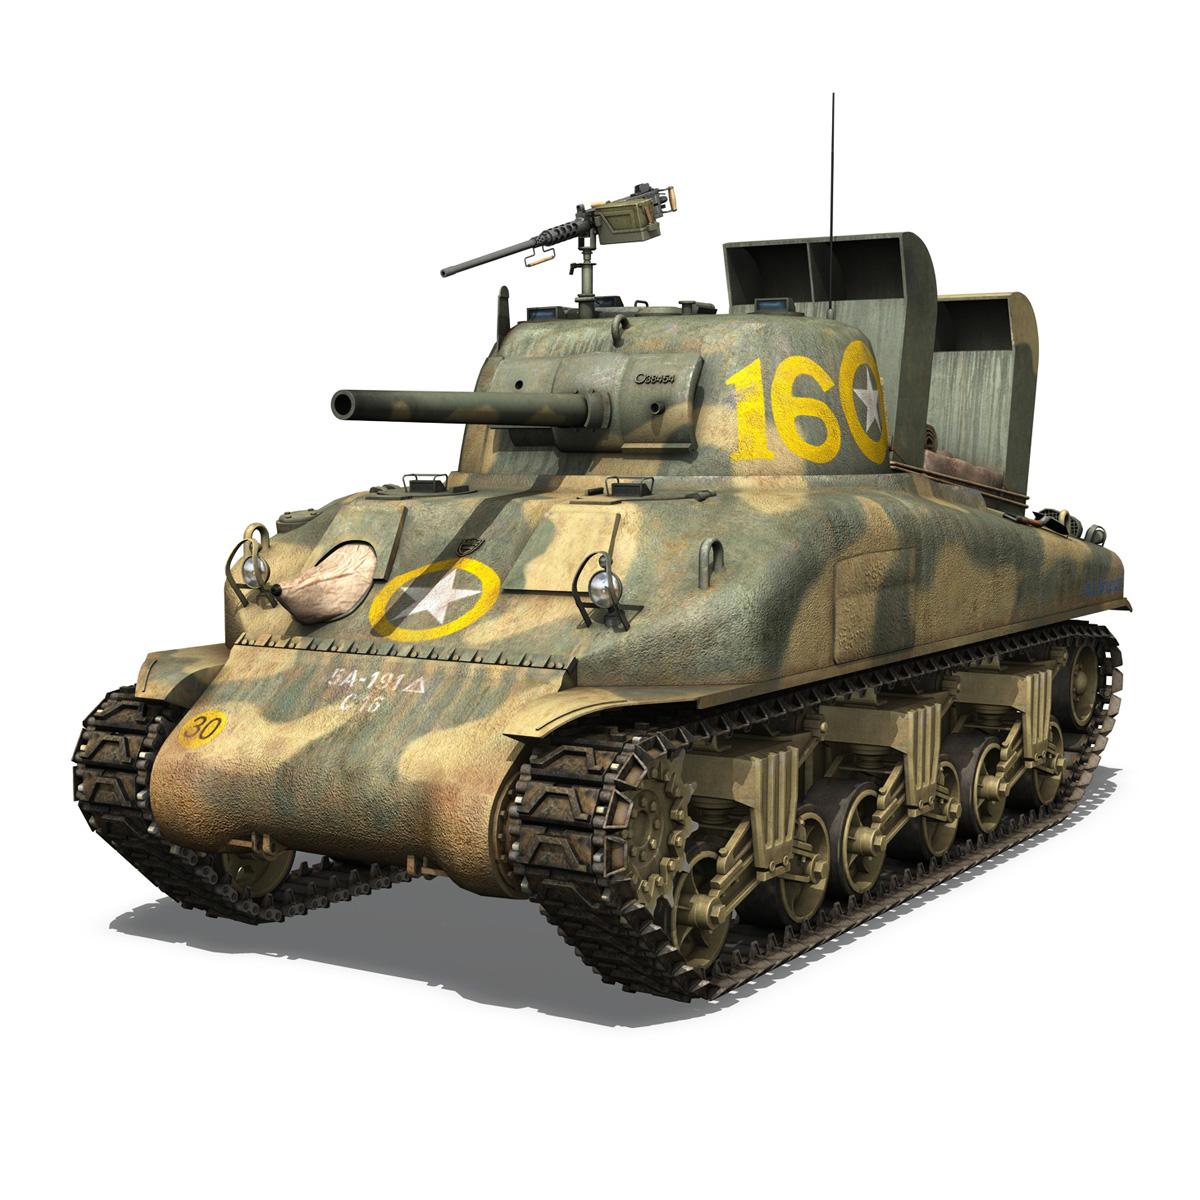 M4A1 Sherman - 16 3d model 3ds fbx c4d lwo lws lw obj 273051